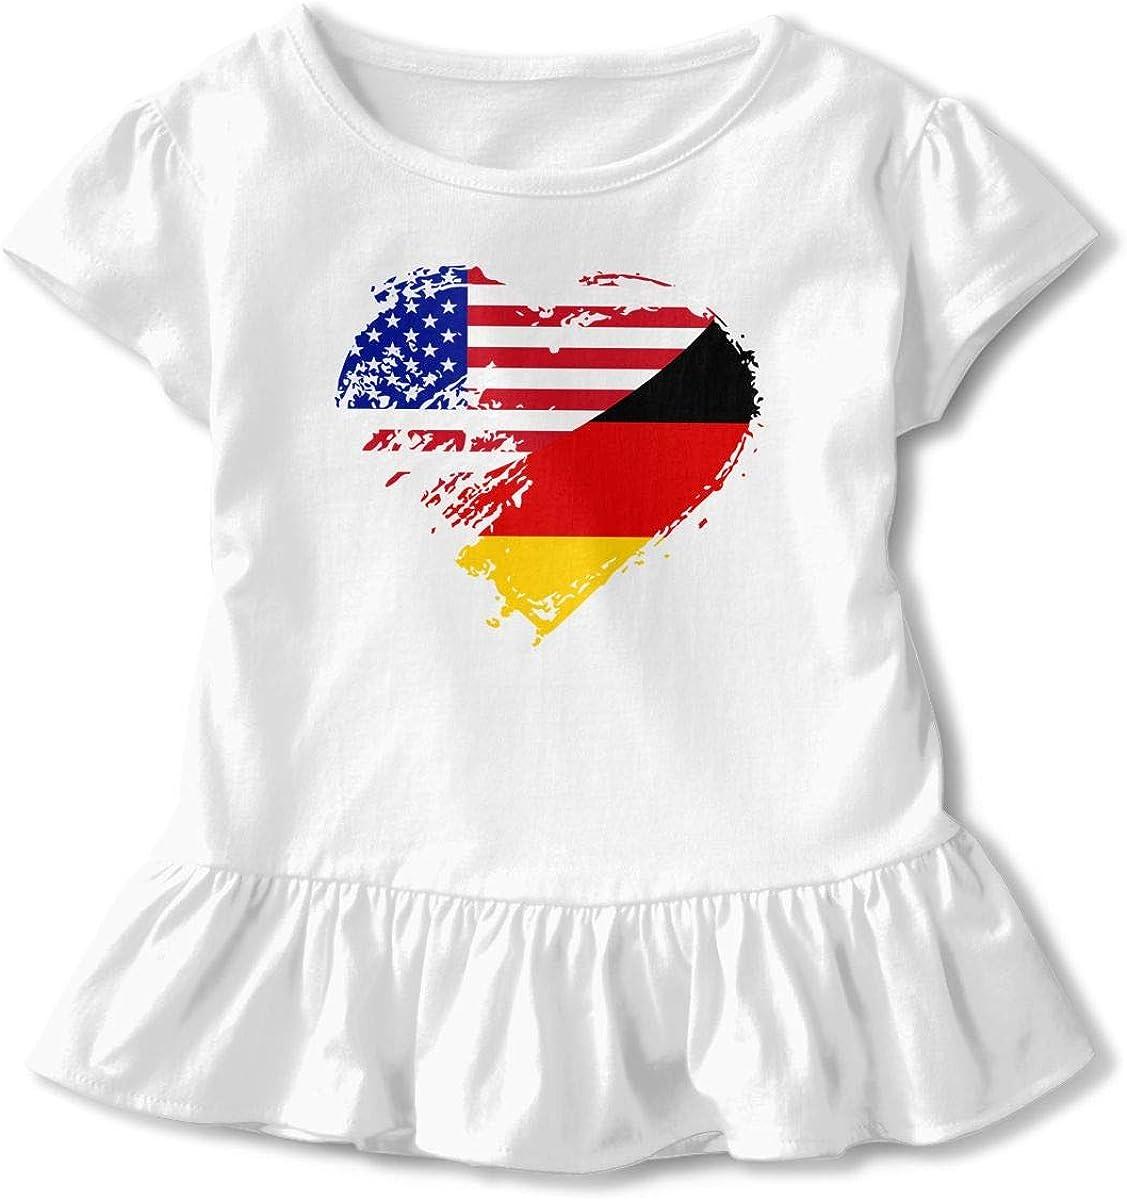 German American Heart Flag Toddler Baby Girl Short Sleeve Peplum Tee Tops